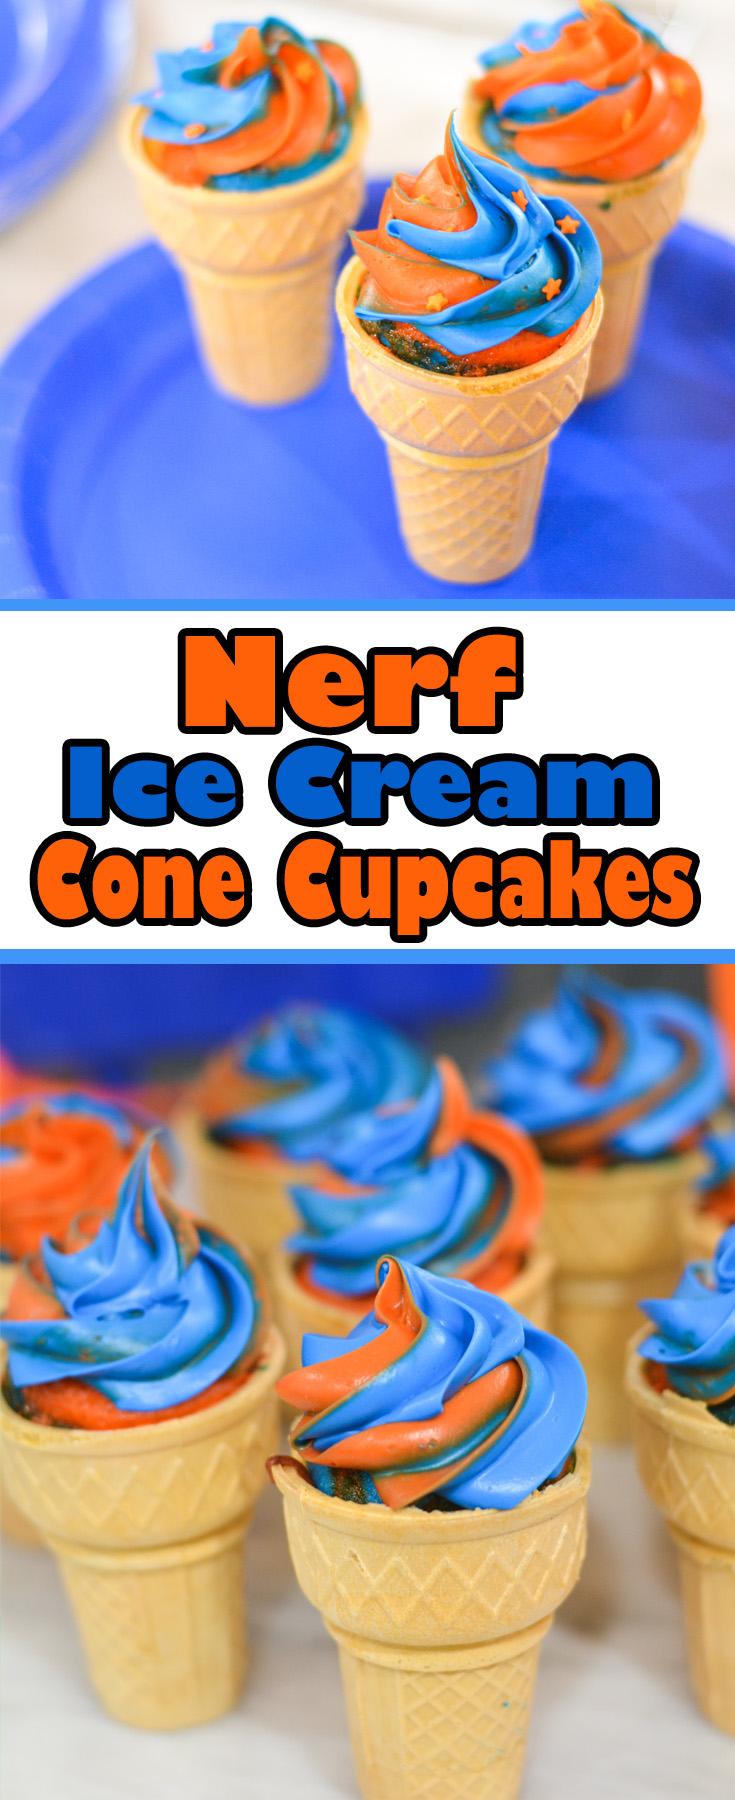 nerf cupcakes